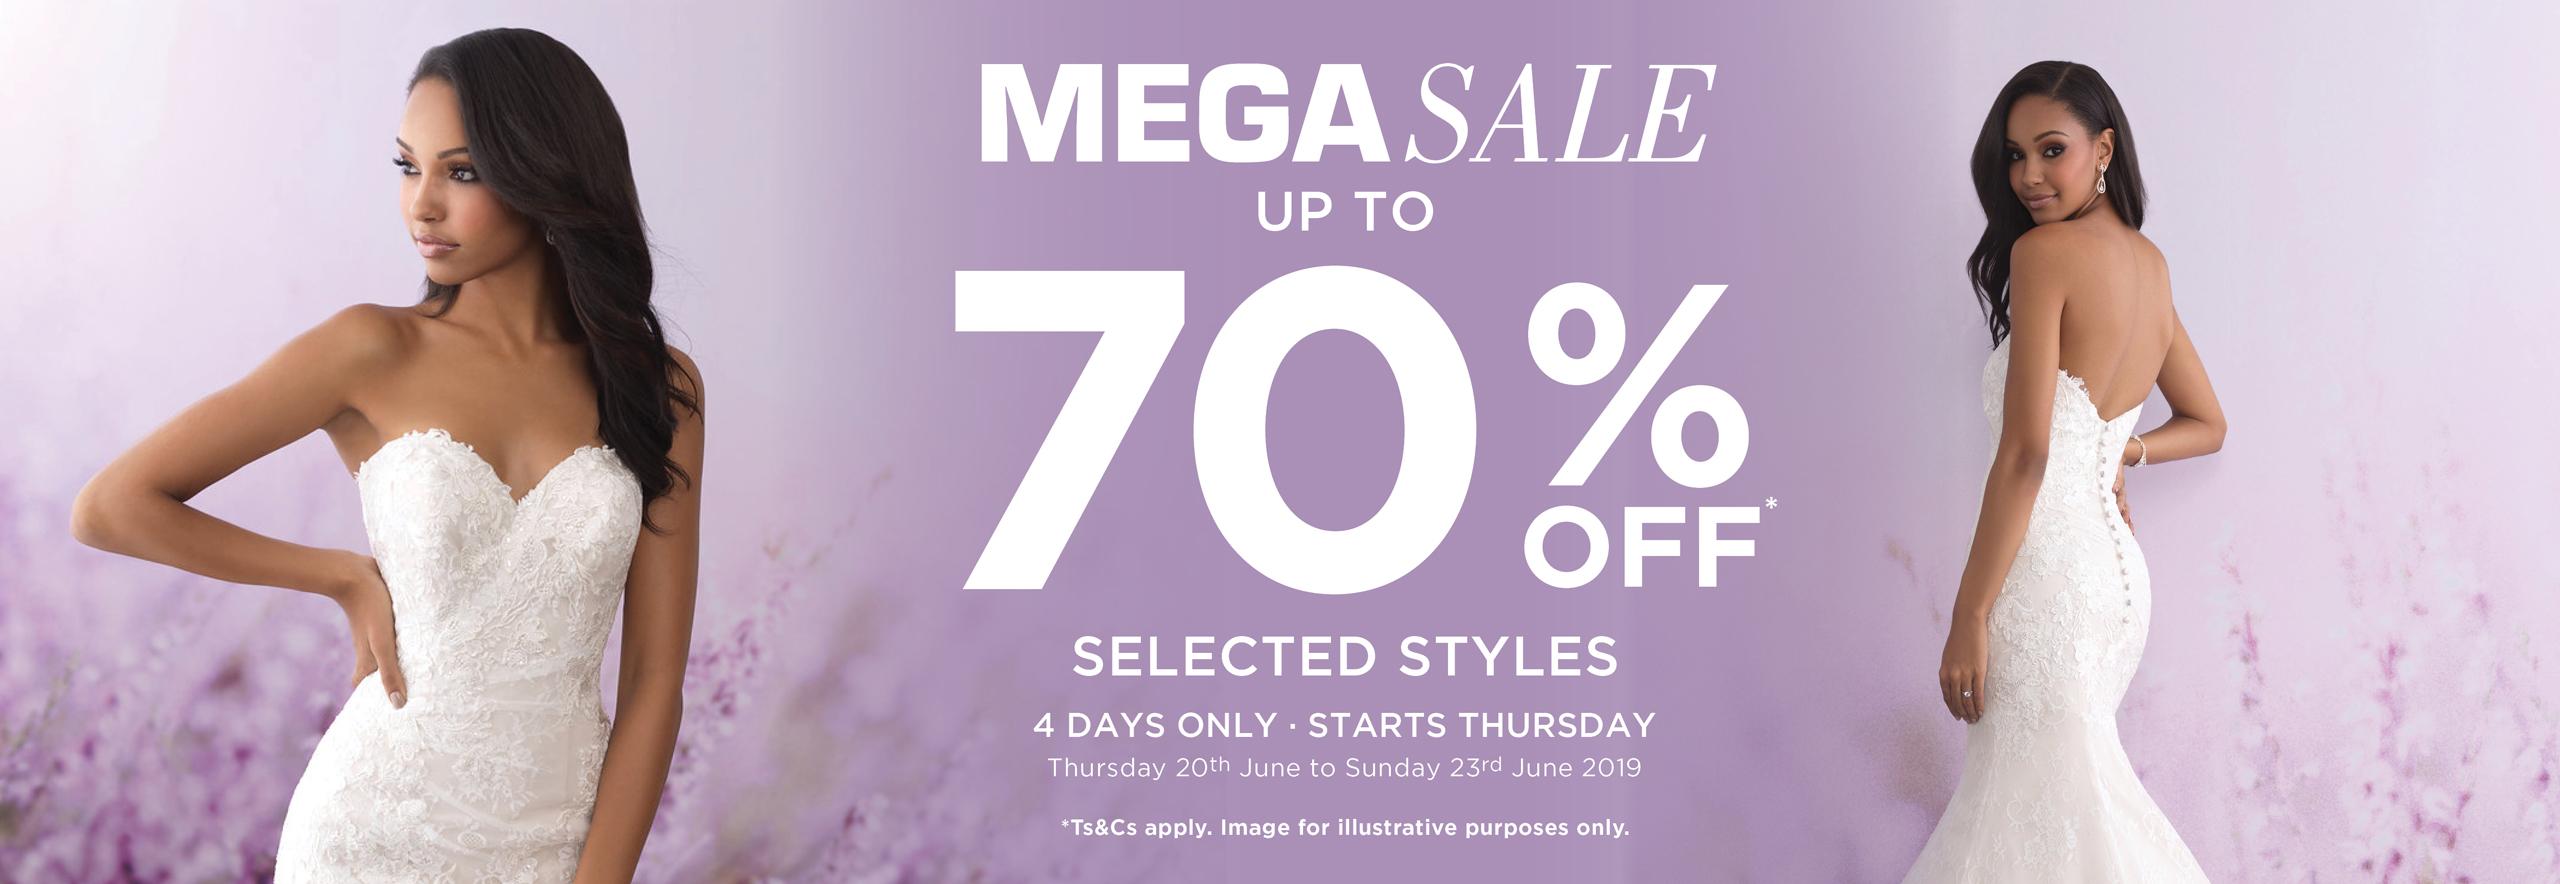 BOS Mega Sale Web Banner